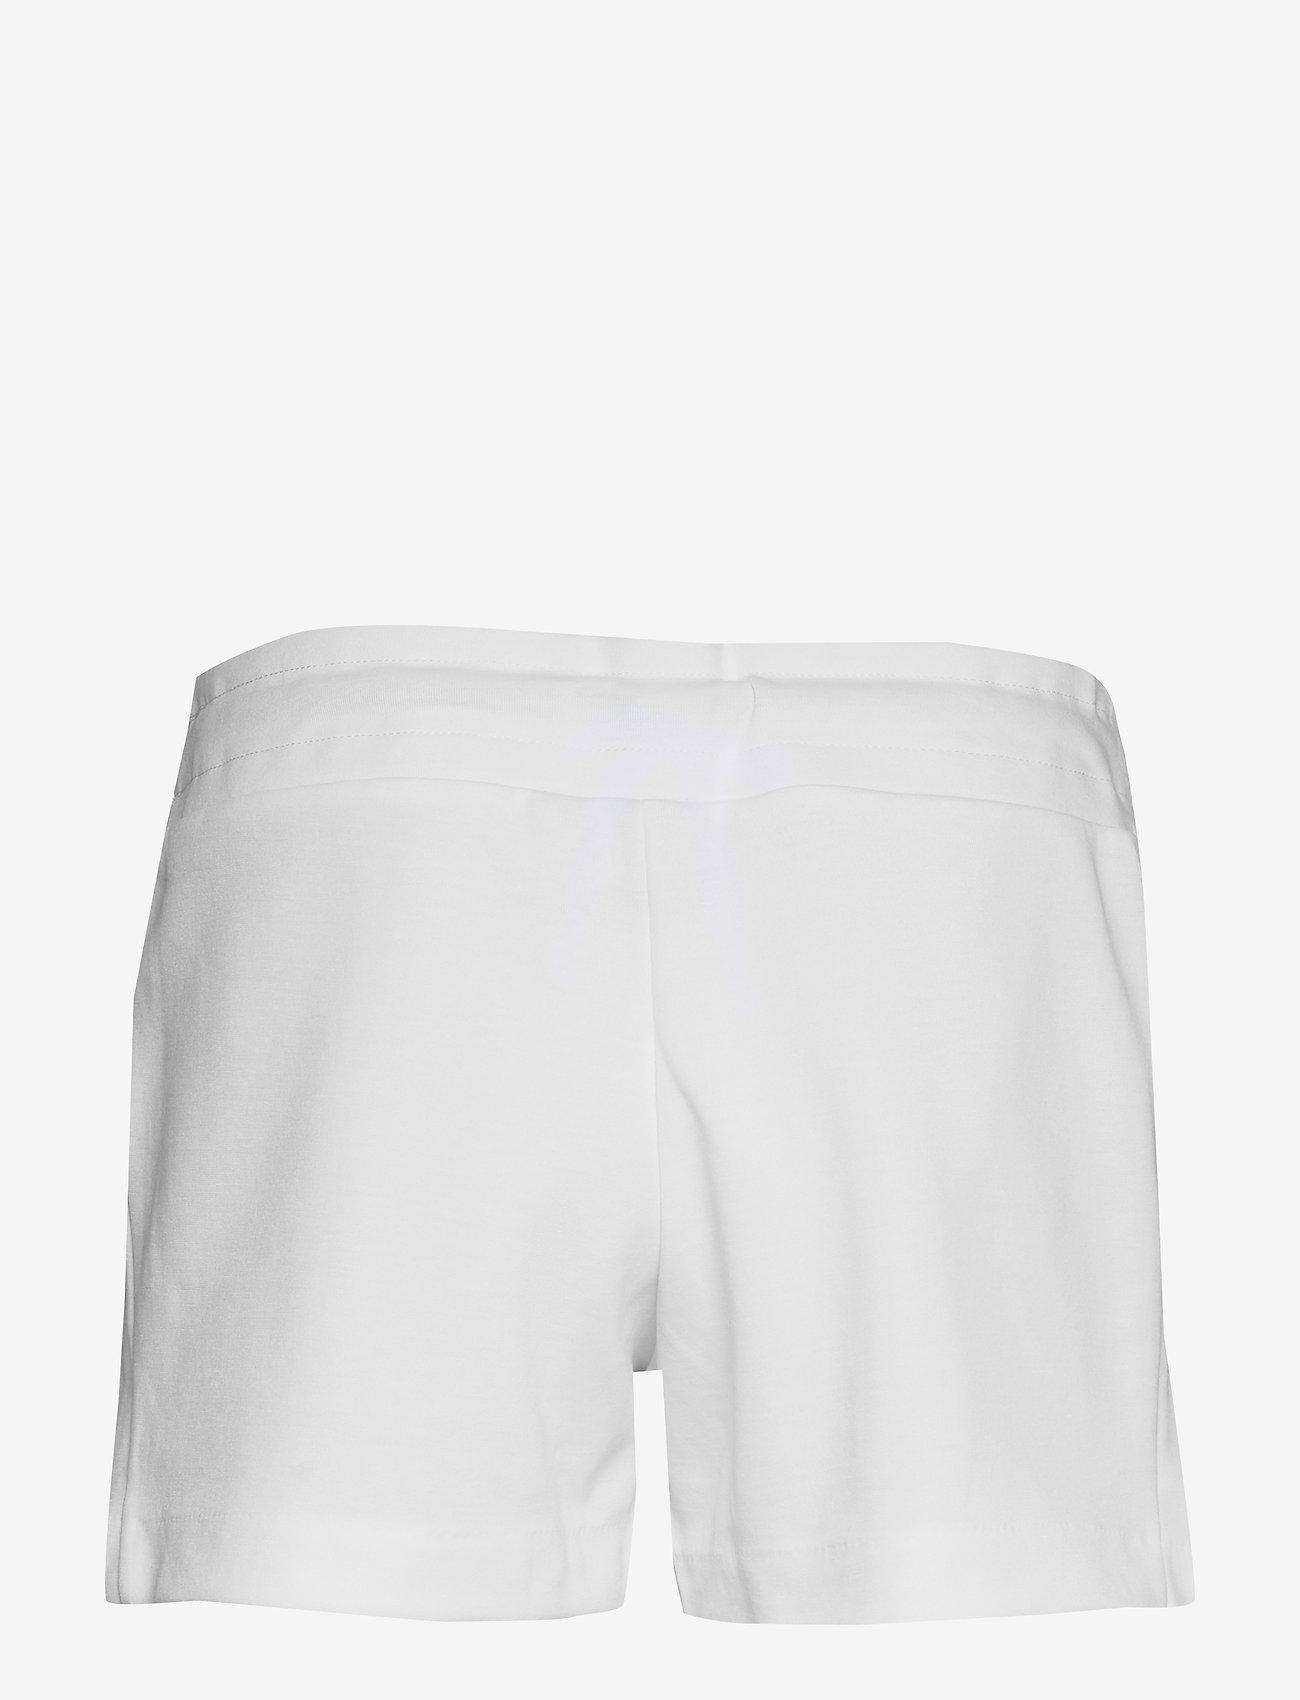 Sail Racing - W RACE SHORTS - training shorts - white - 1